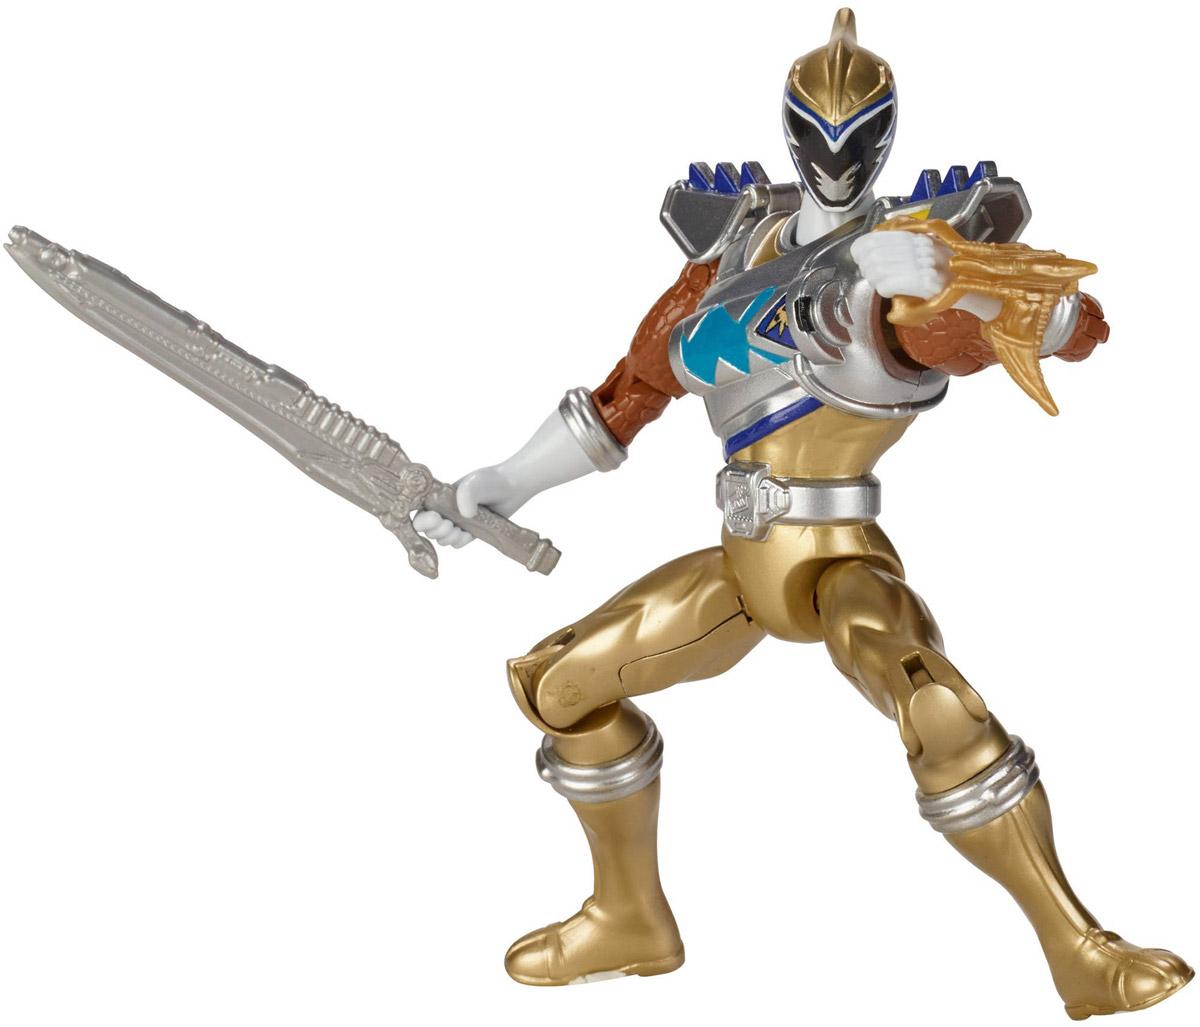 Power Rangers Фигурка Dino Drive Gold Ranger jada могучие рейнджеры фигурка black ranger